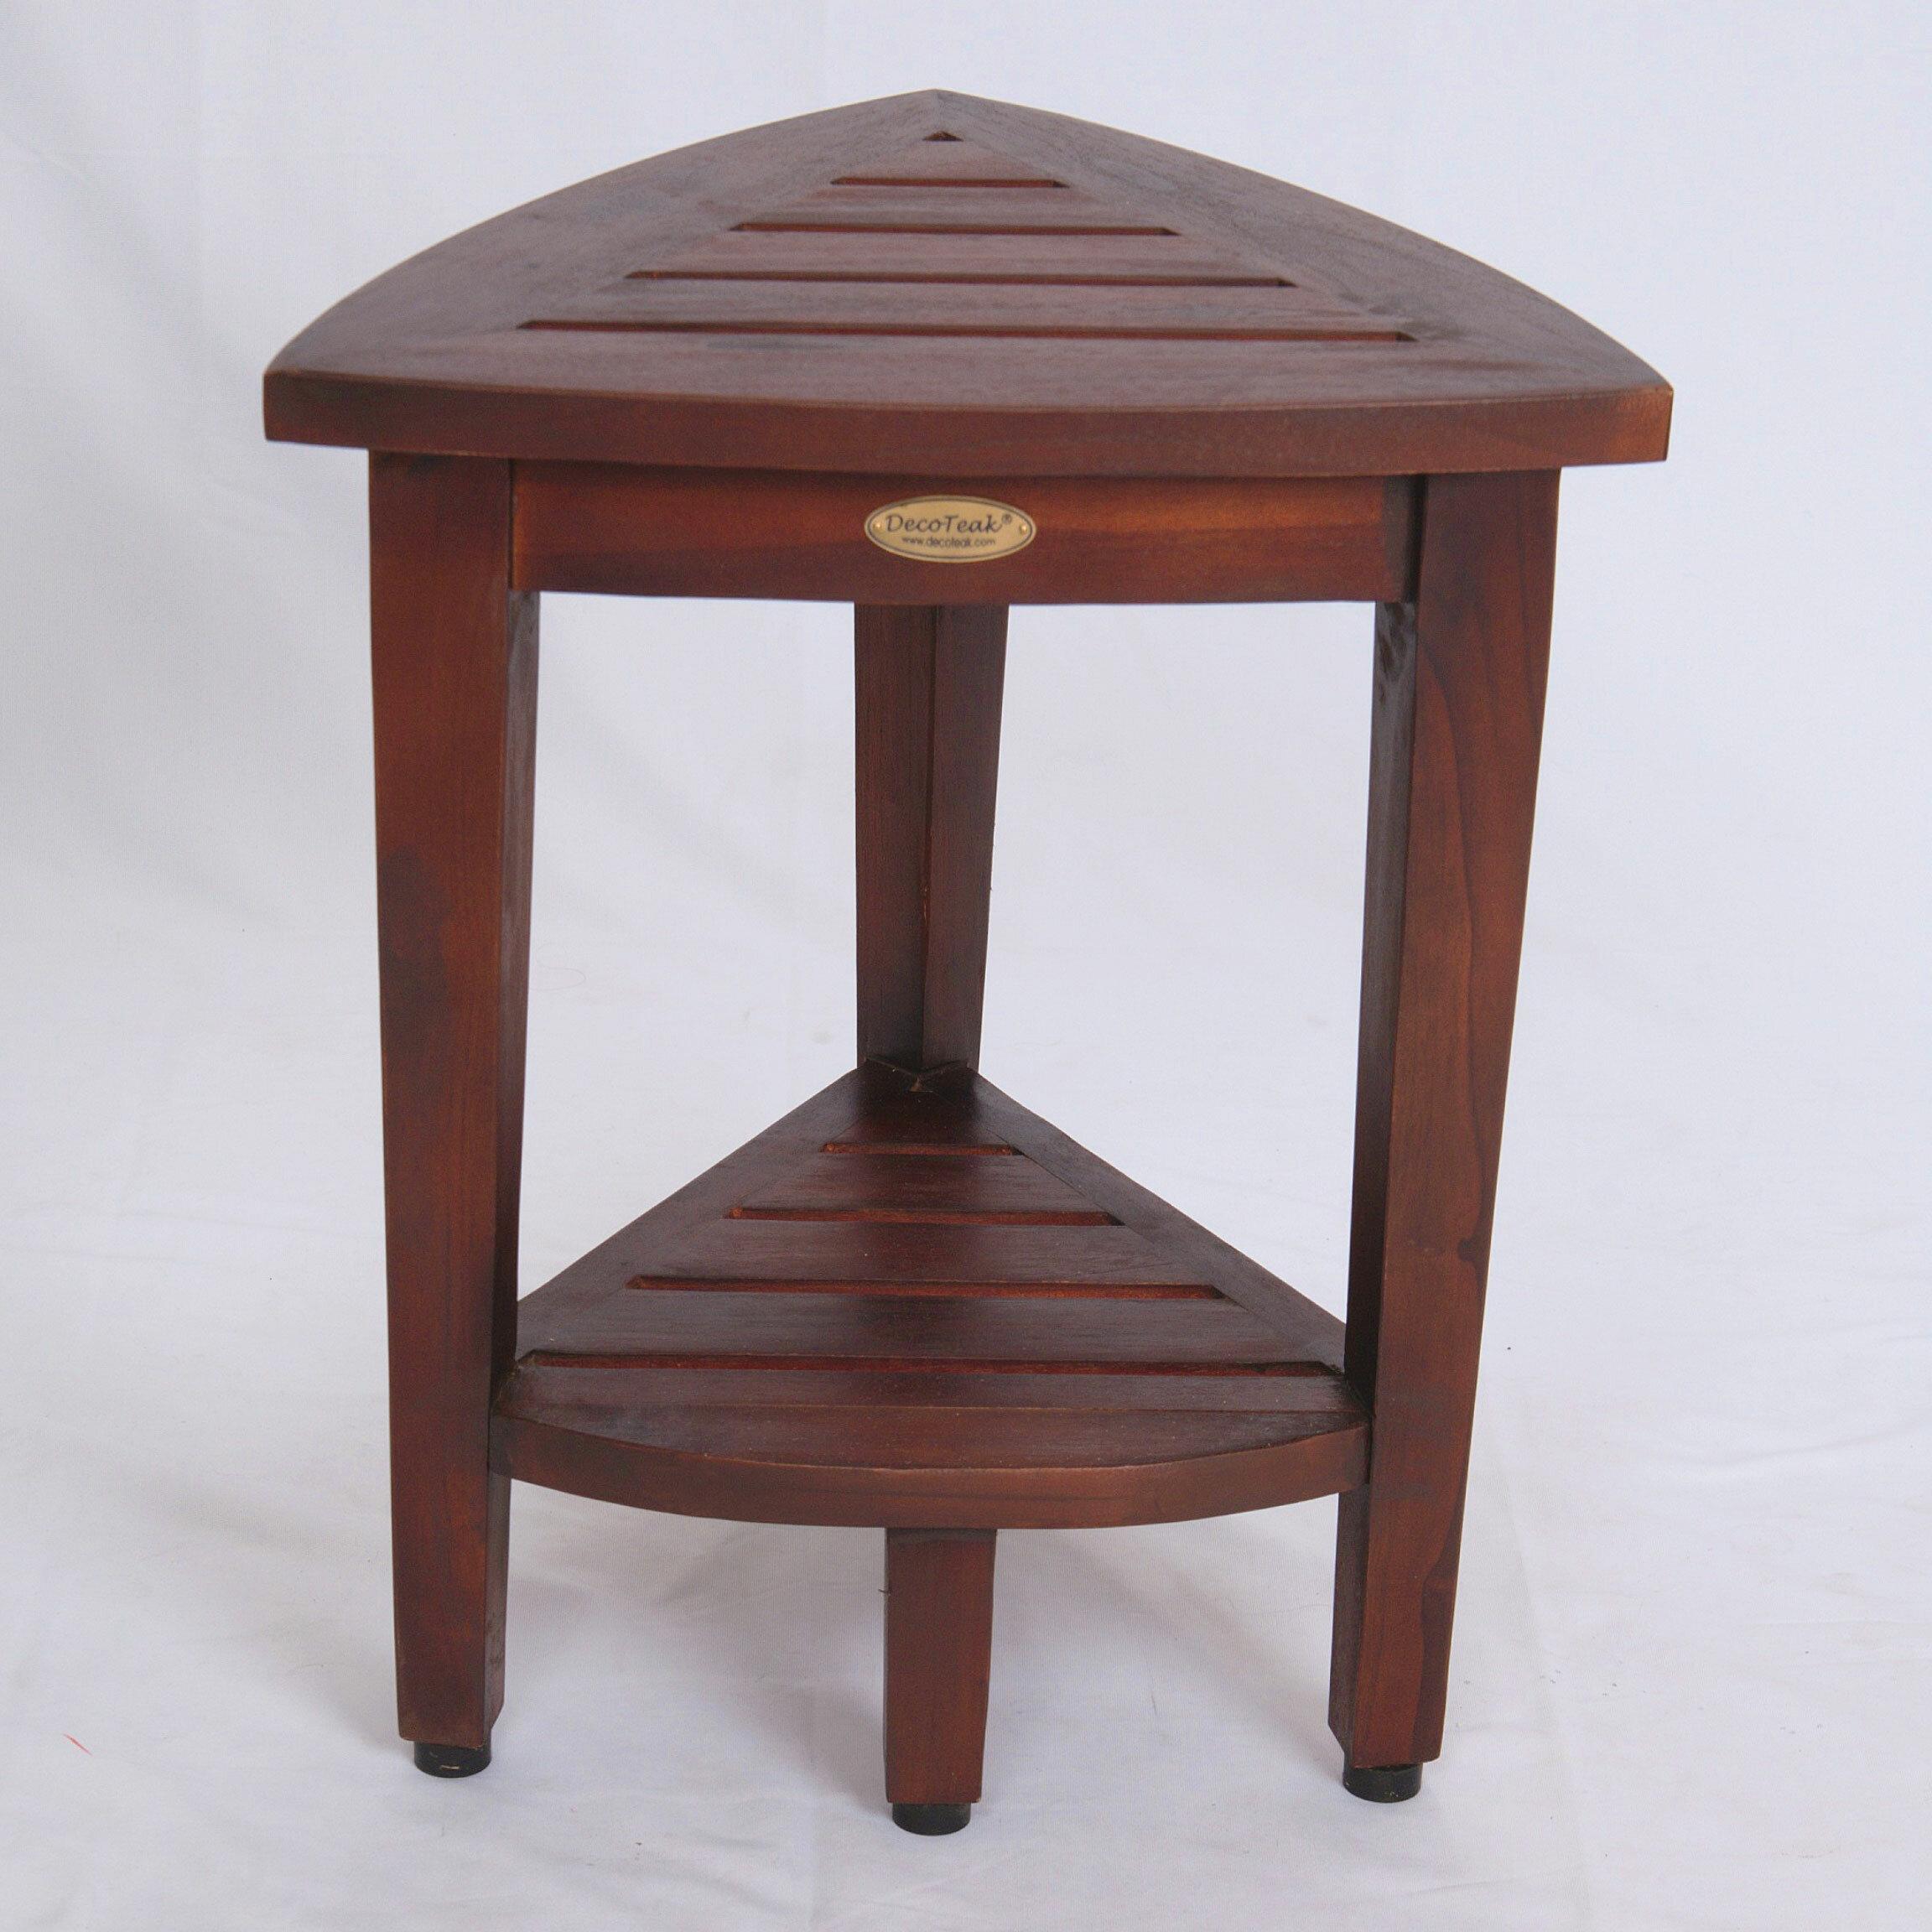 Decoteak Oasis Compact Teak Corner Shower Seat & Reviews   Wayfair